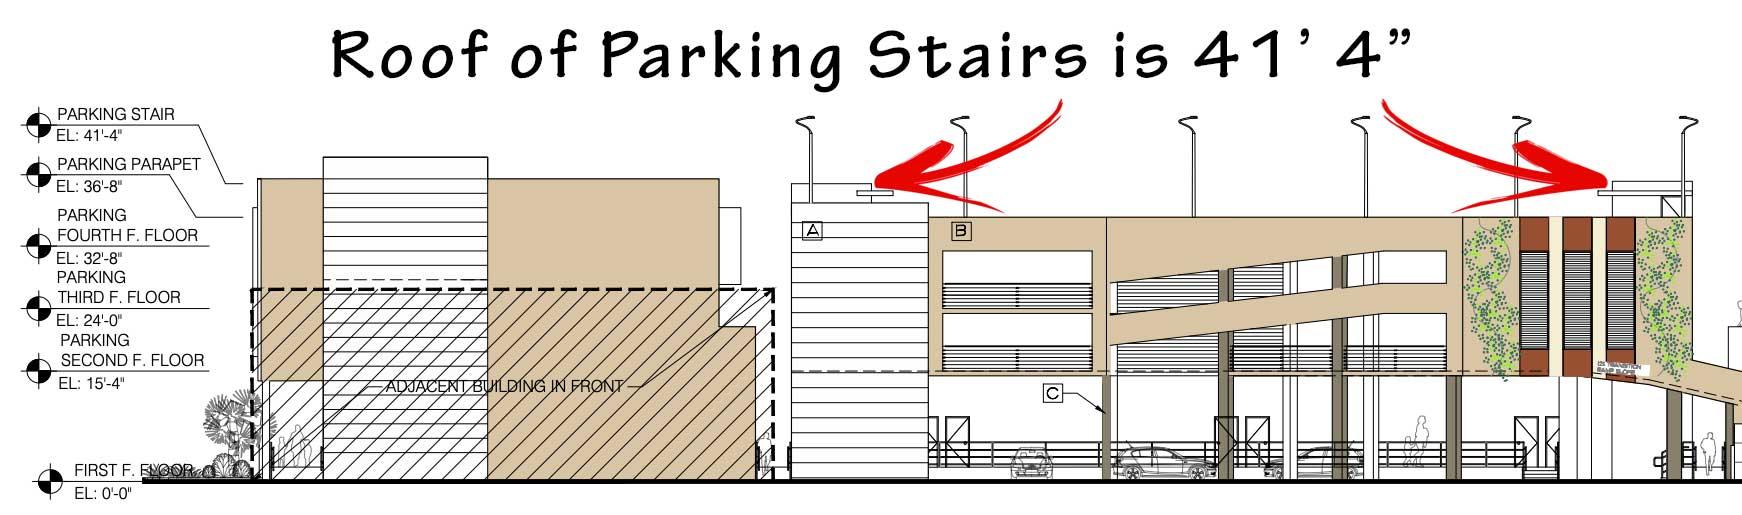 Parking Garage Stairwell Roof Height Exceeds 40' Limit